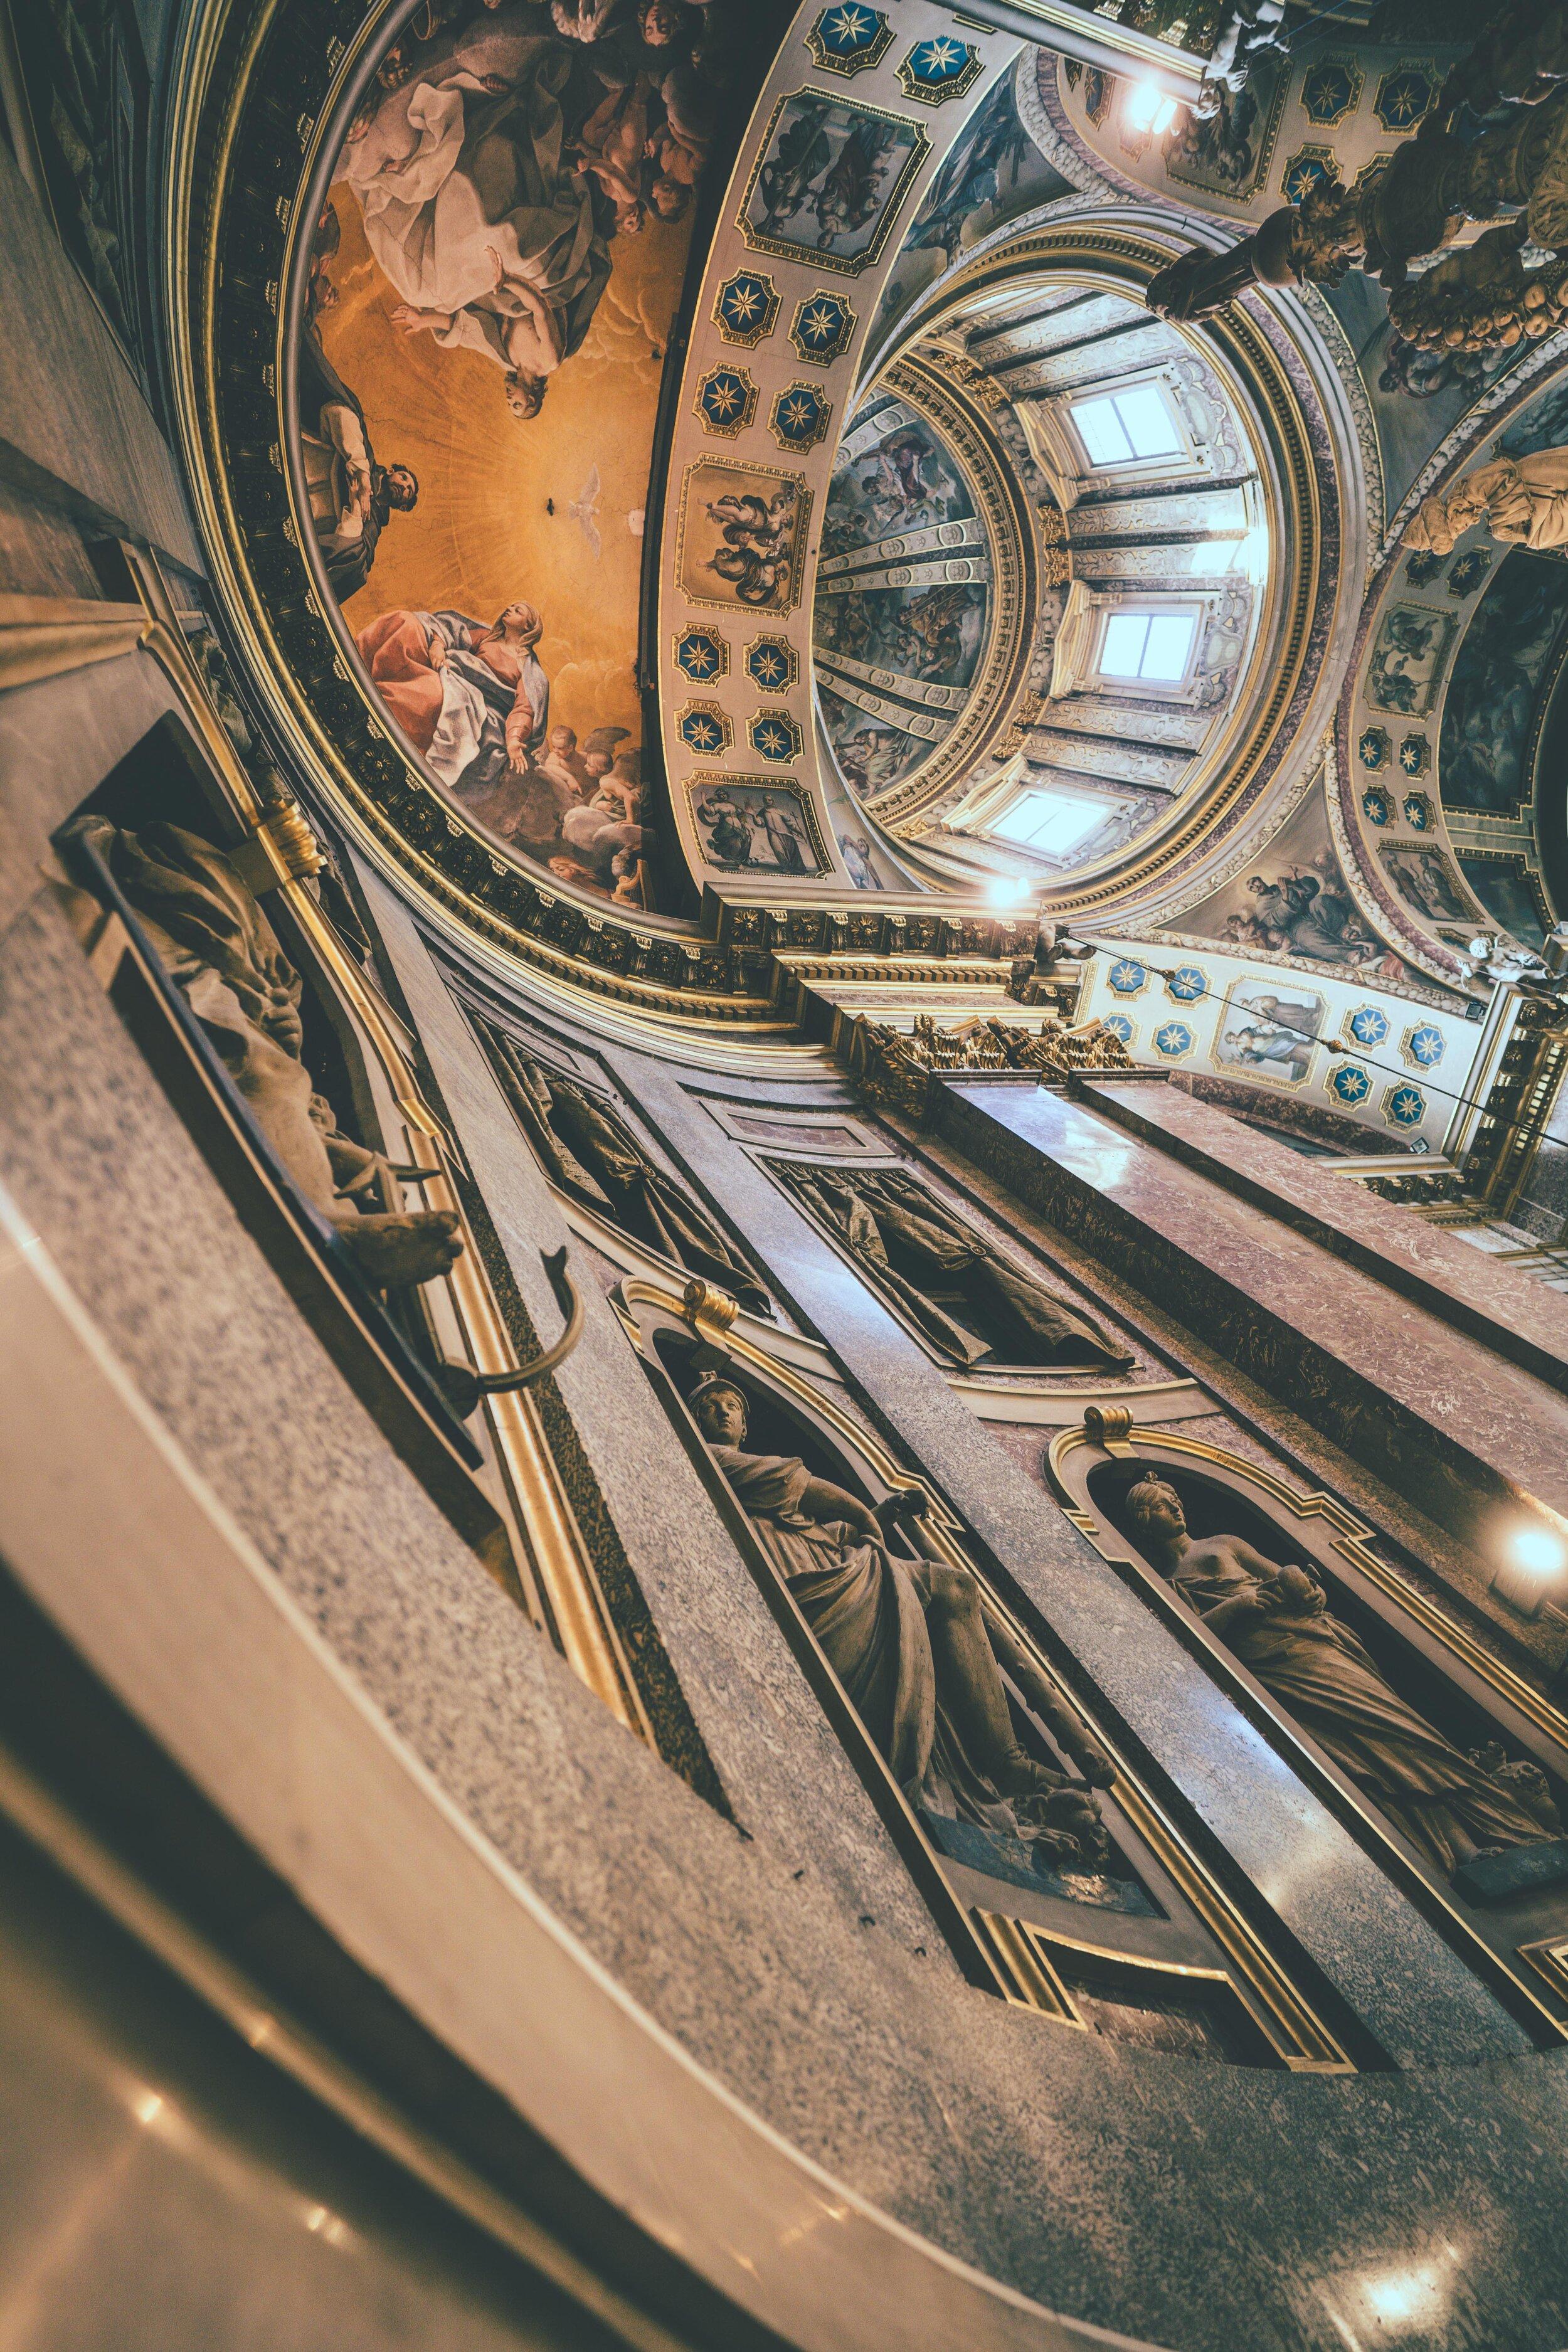 bologna st dominic michelangelo roof painting.jpg